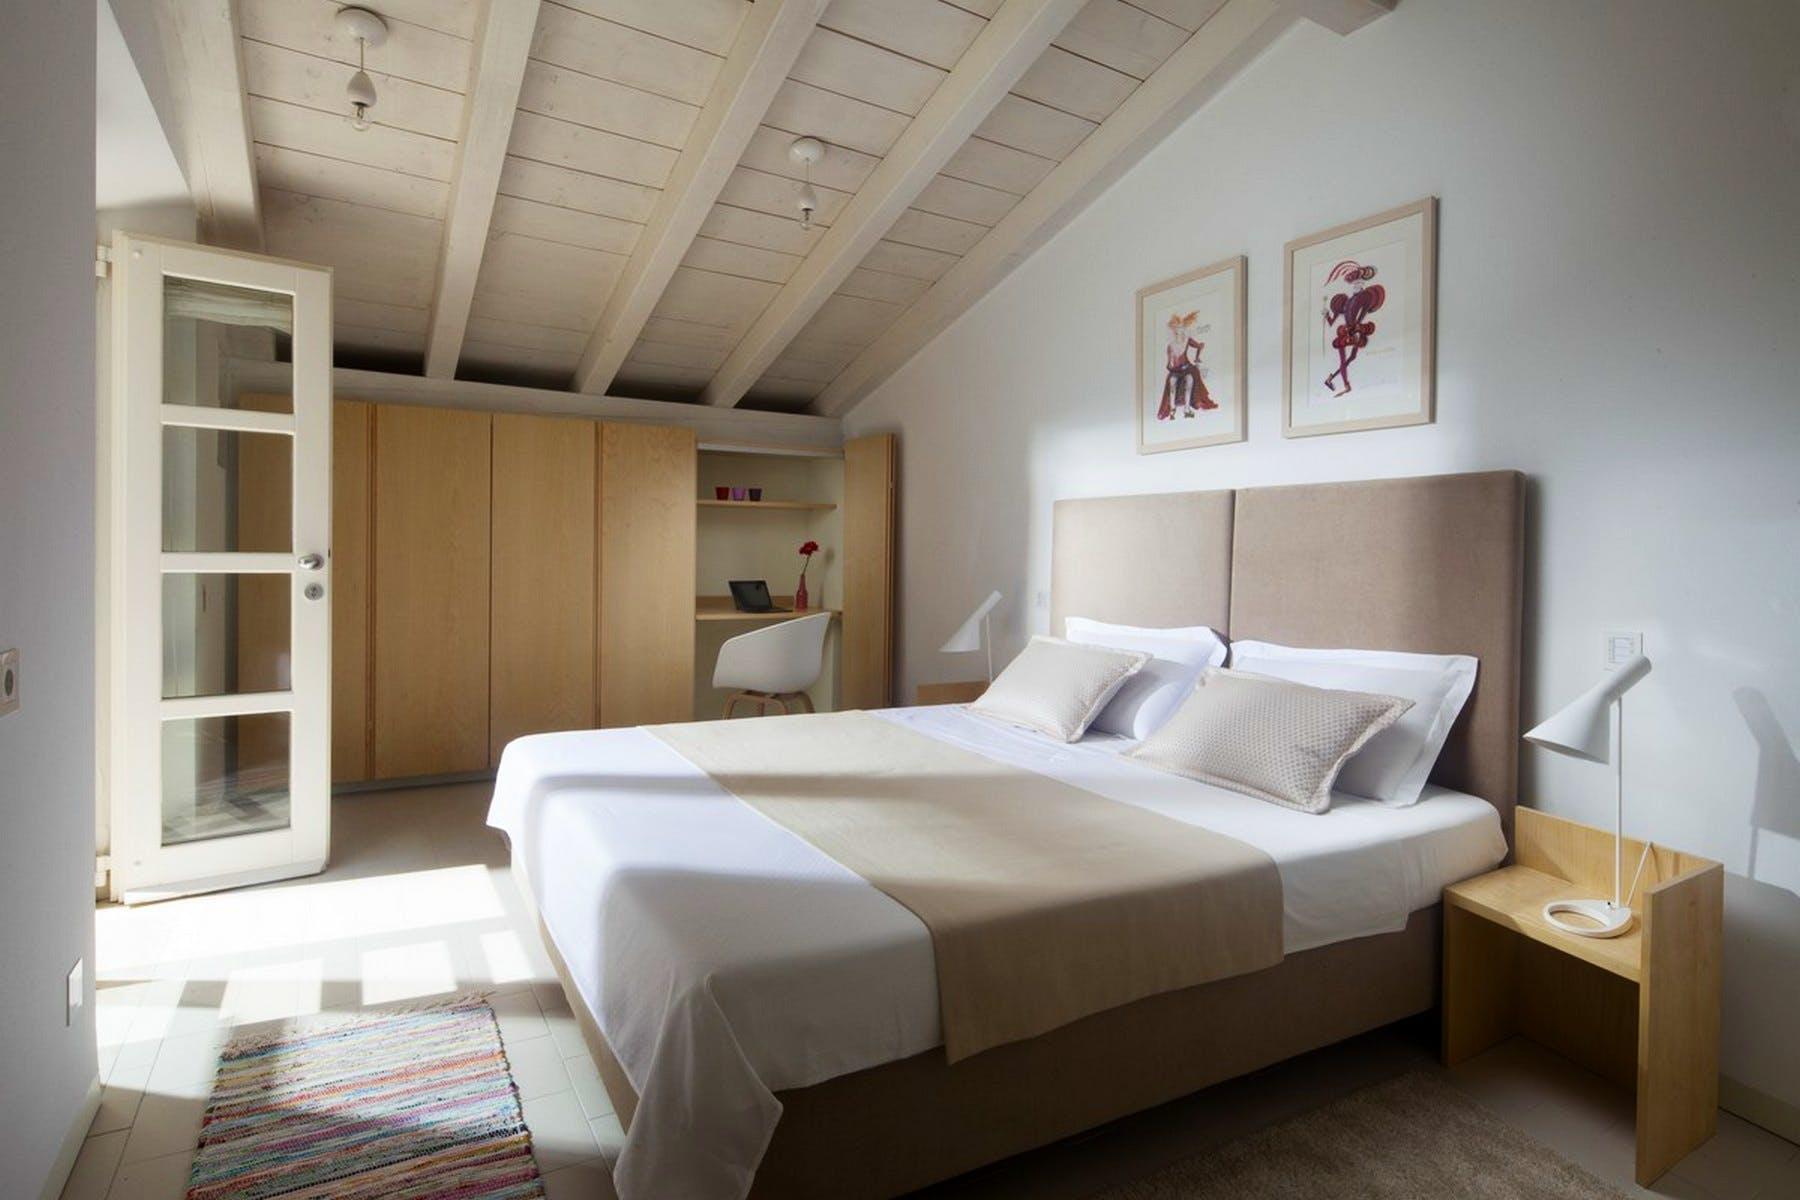 Double bedroom boasting wooden details